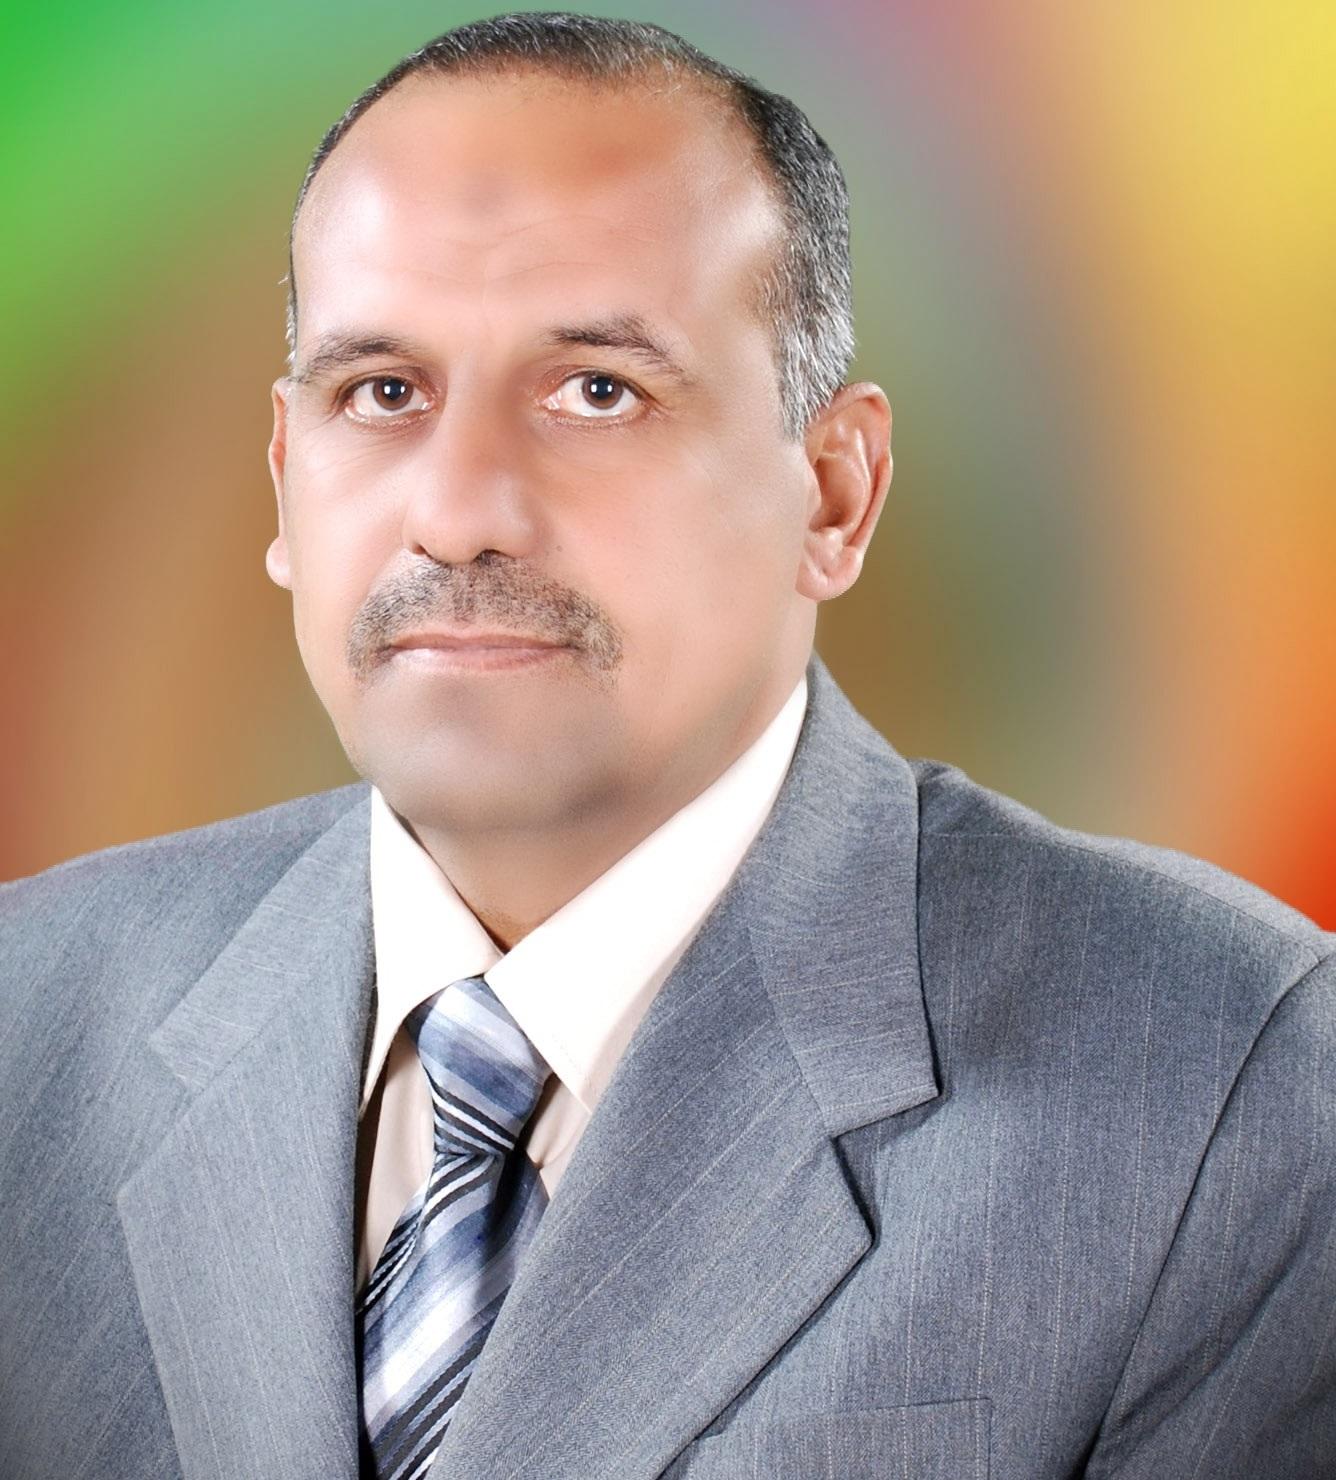 Shaker Majeed Khadhim